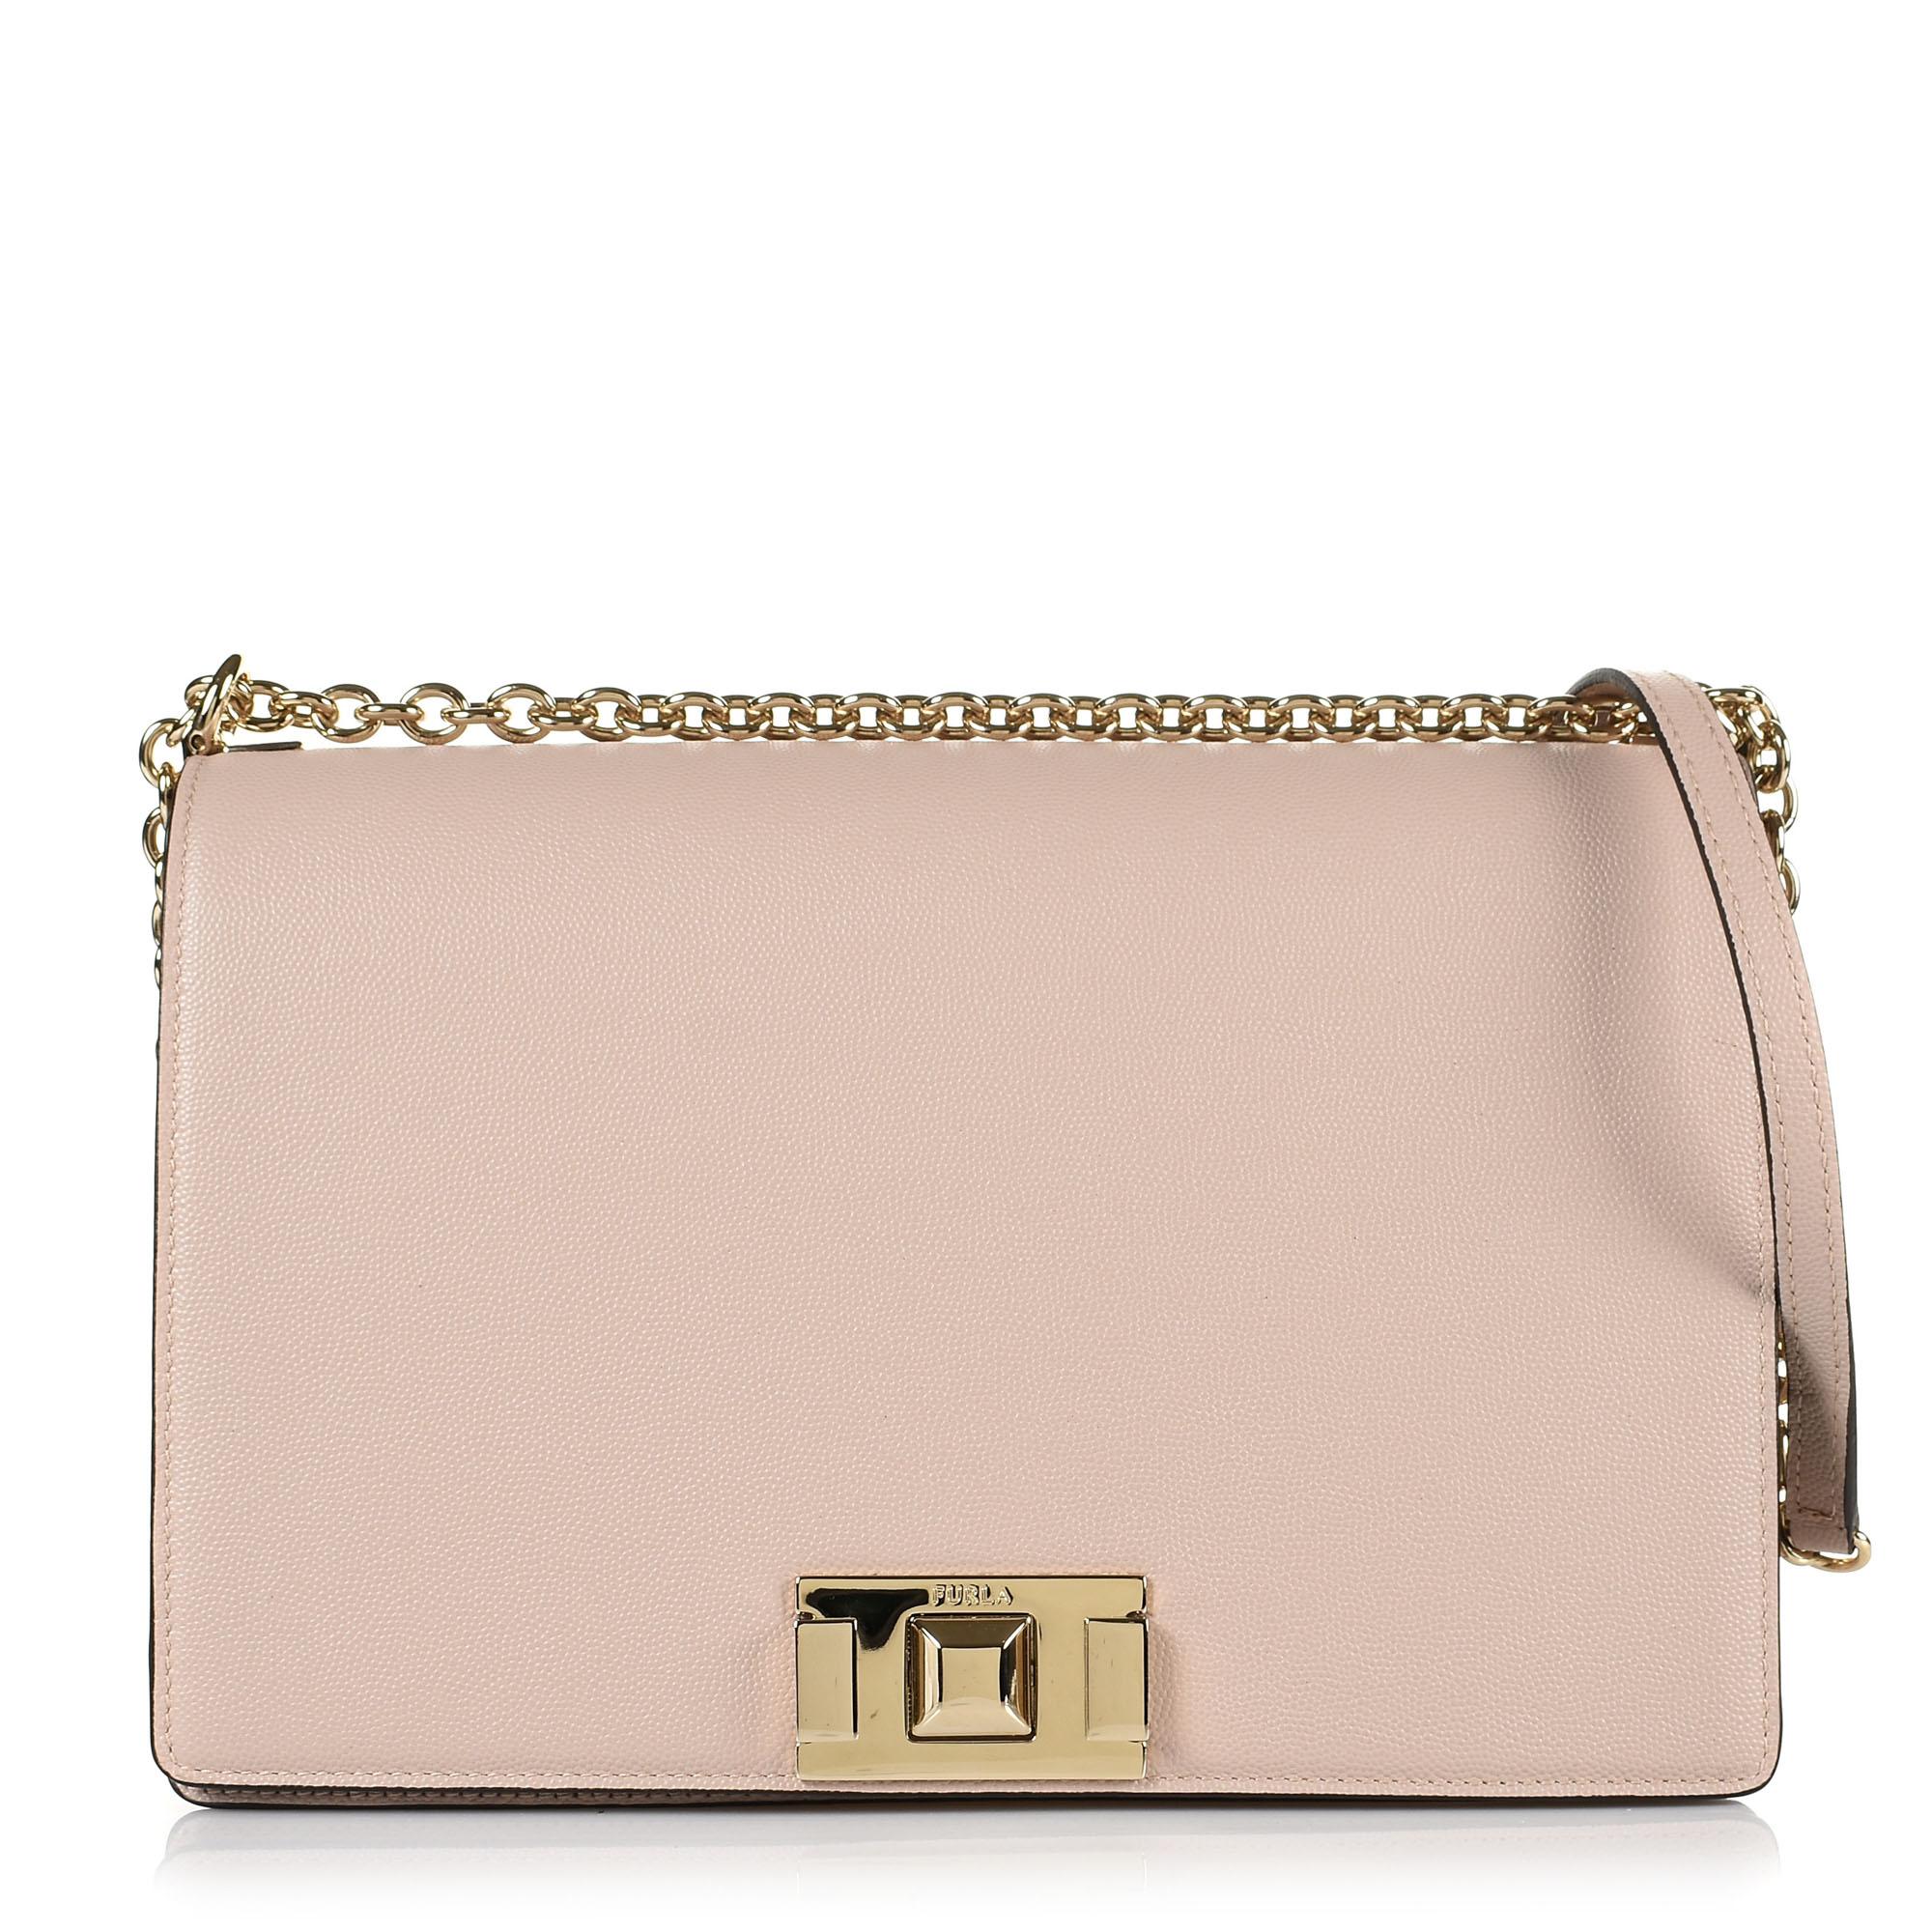 1f37458337 Brand Bags Δερμάτινη Τσάντα Ώμου-Χιαστί Furla 10218